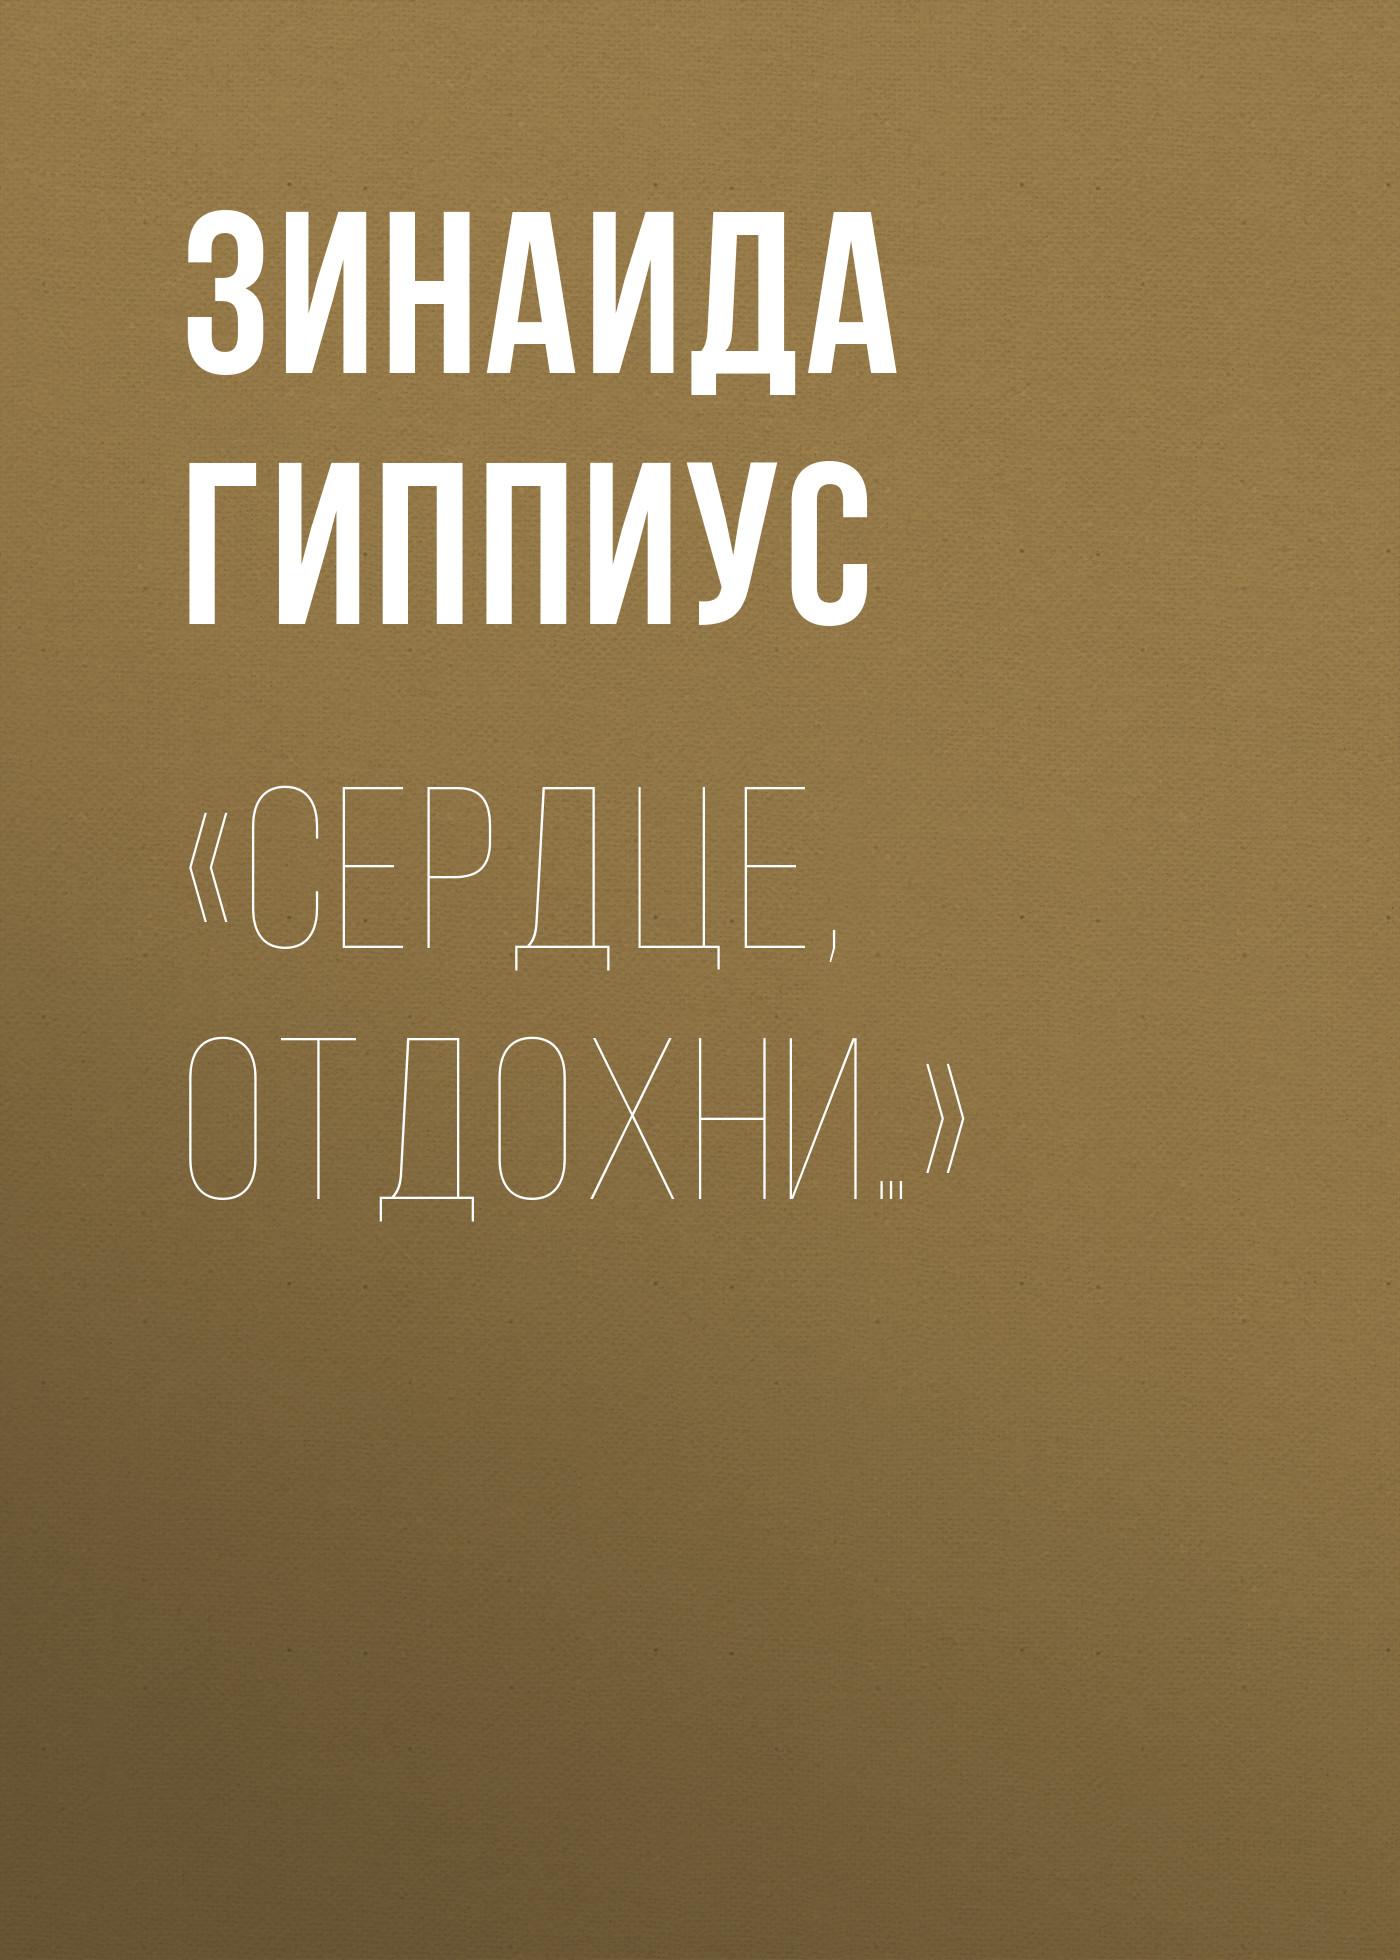 Зинаида Гиппиус «Сердце, отдохни…»